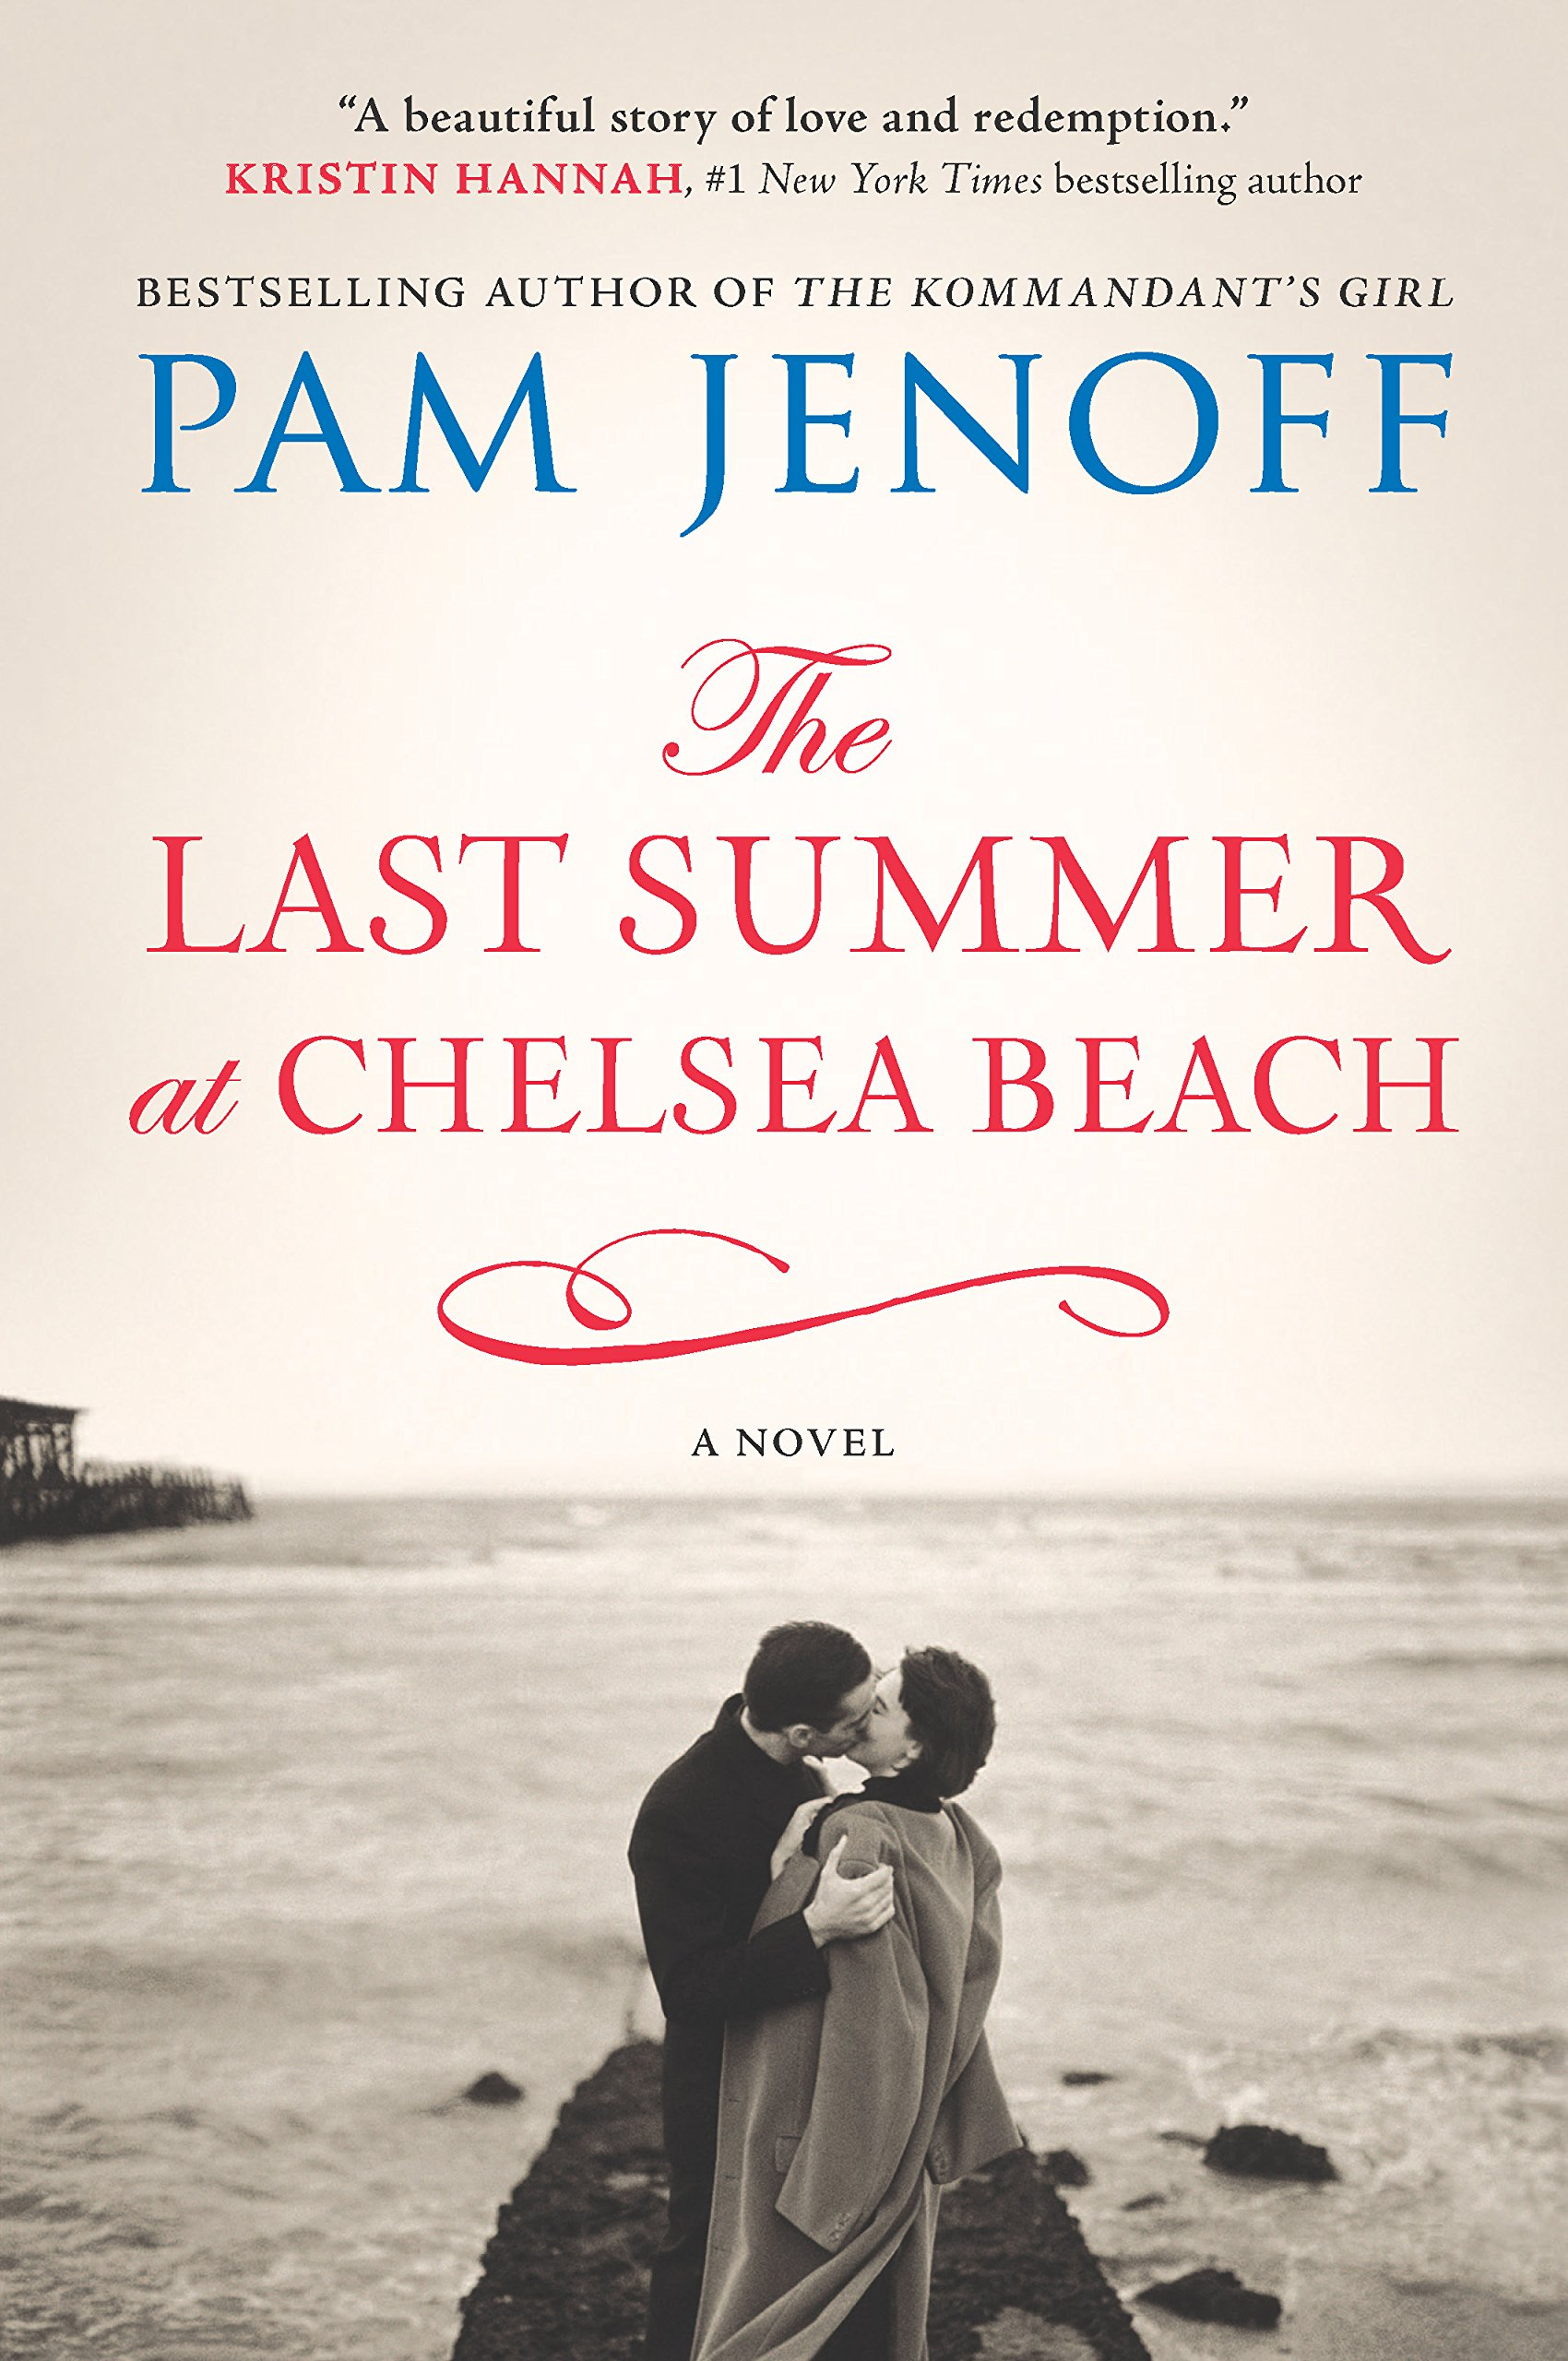 The Last Summer at Chelsea Beach: A Novel: Pam Jenoff: 9780778317548:  Amazon.com: Books